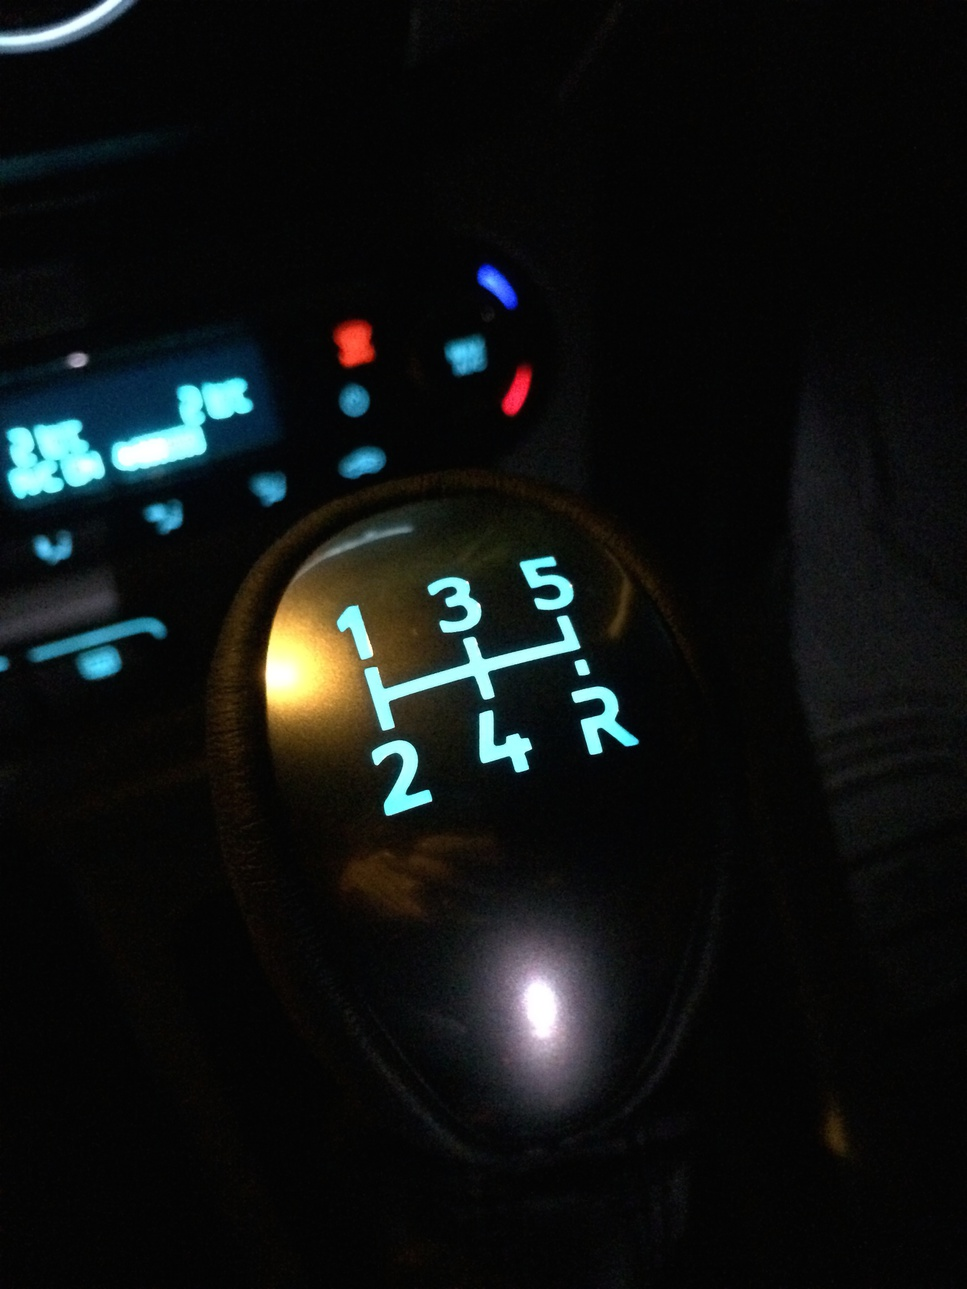 Post pics of your knob's-img_0428.jpg